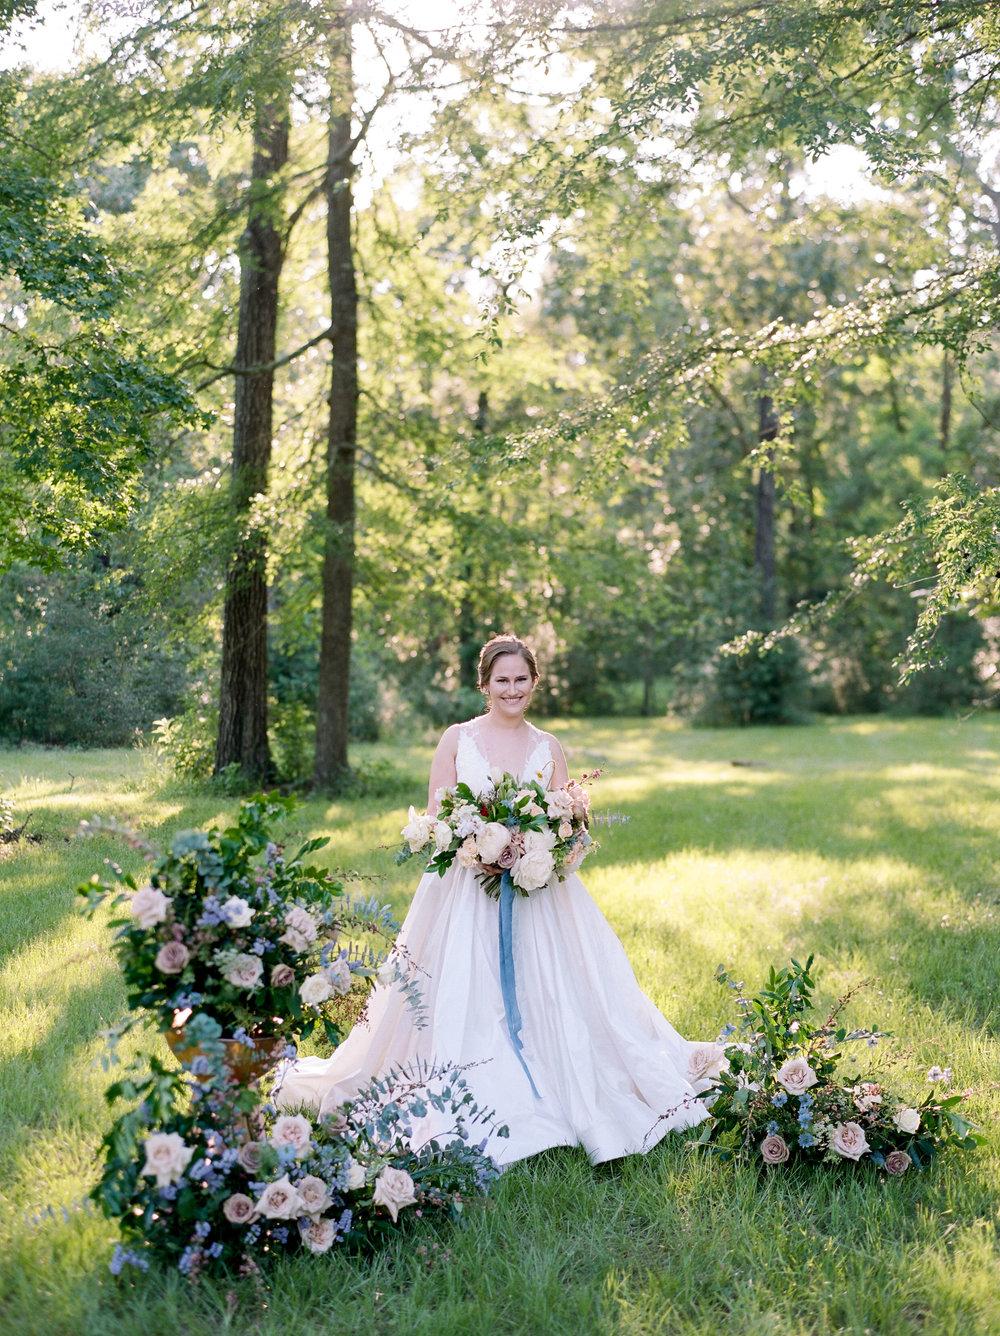 Houston-Fine-Art-Film-Destination-Wedding-Photographer-Top-Best-Luxury-Josh-Dana-Fernandez-Photographer-Austin-Texas-1.jpg